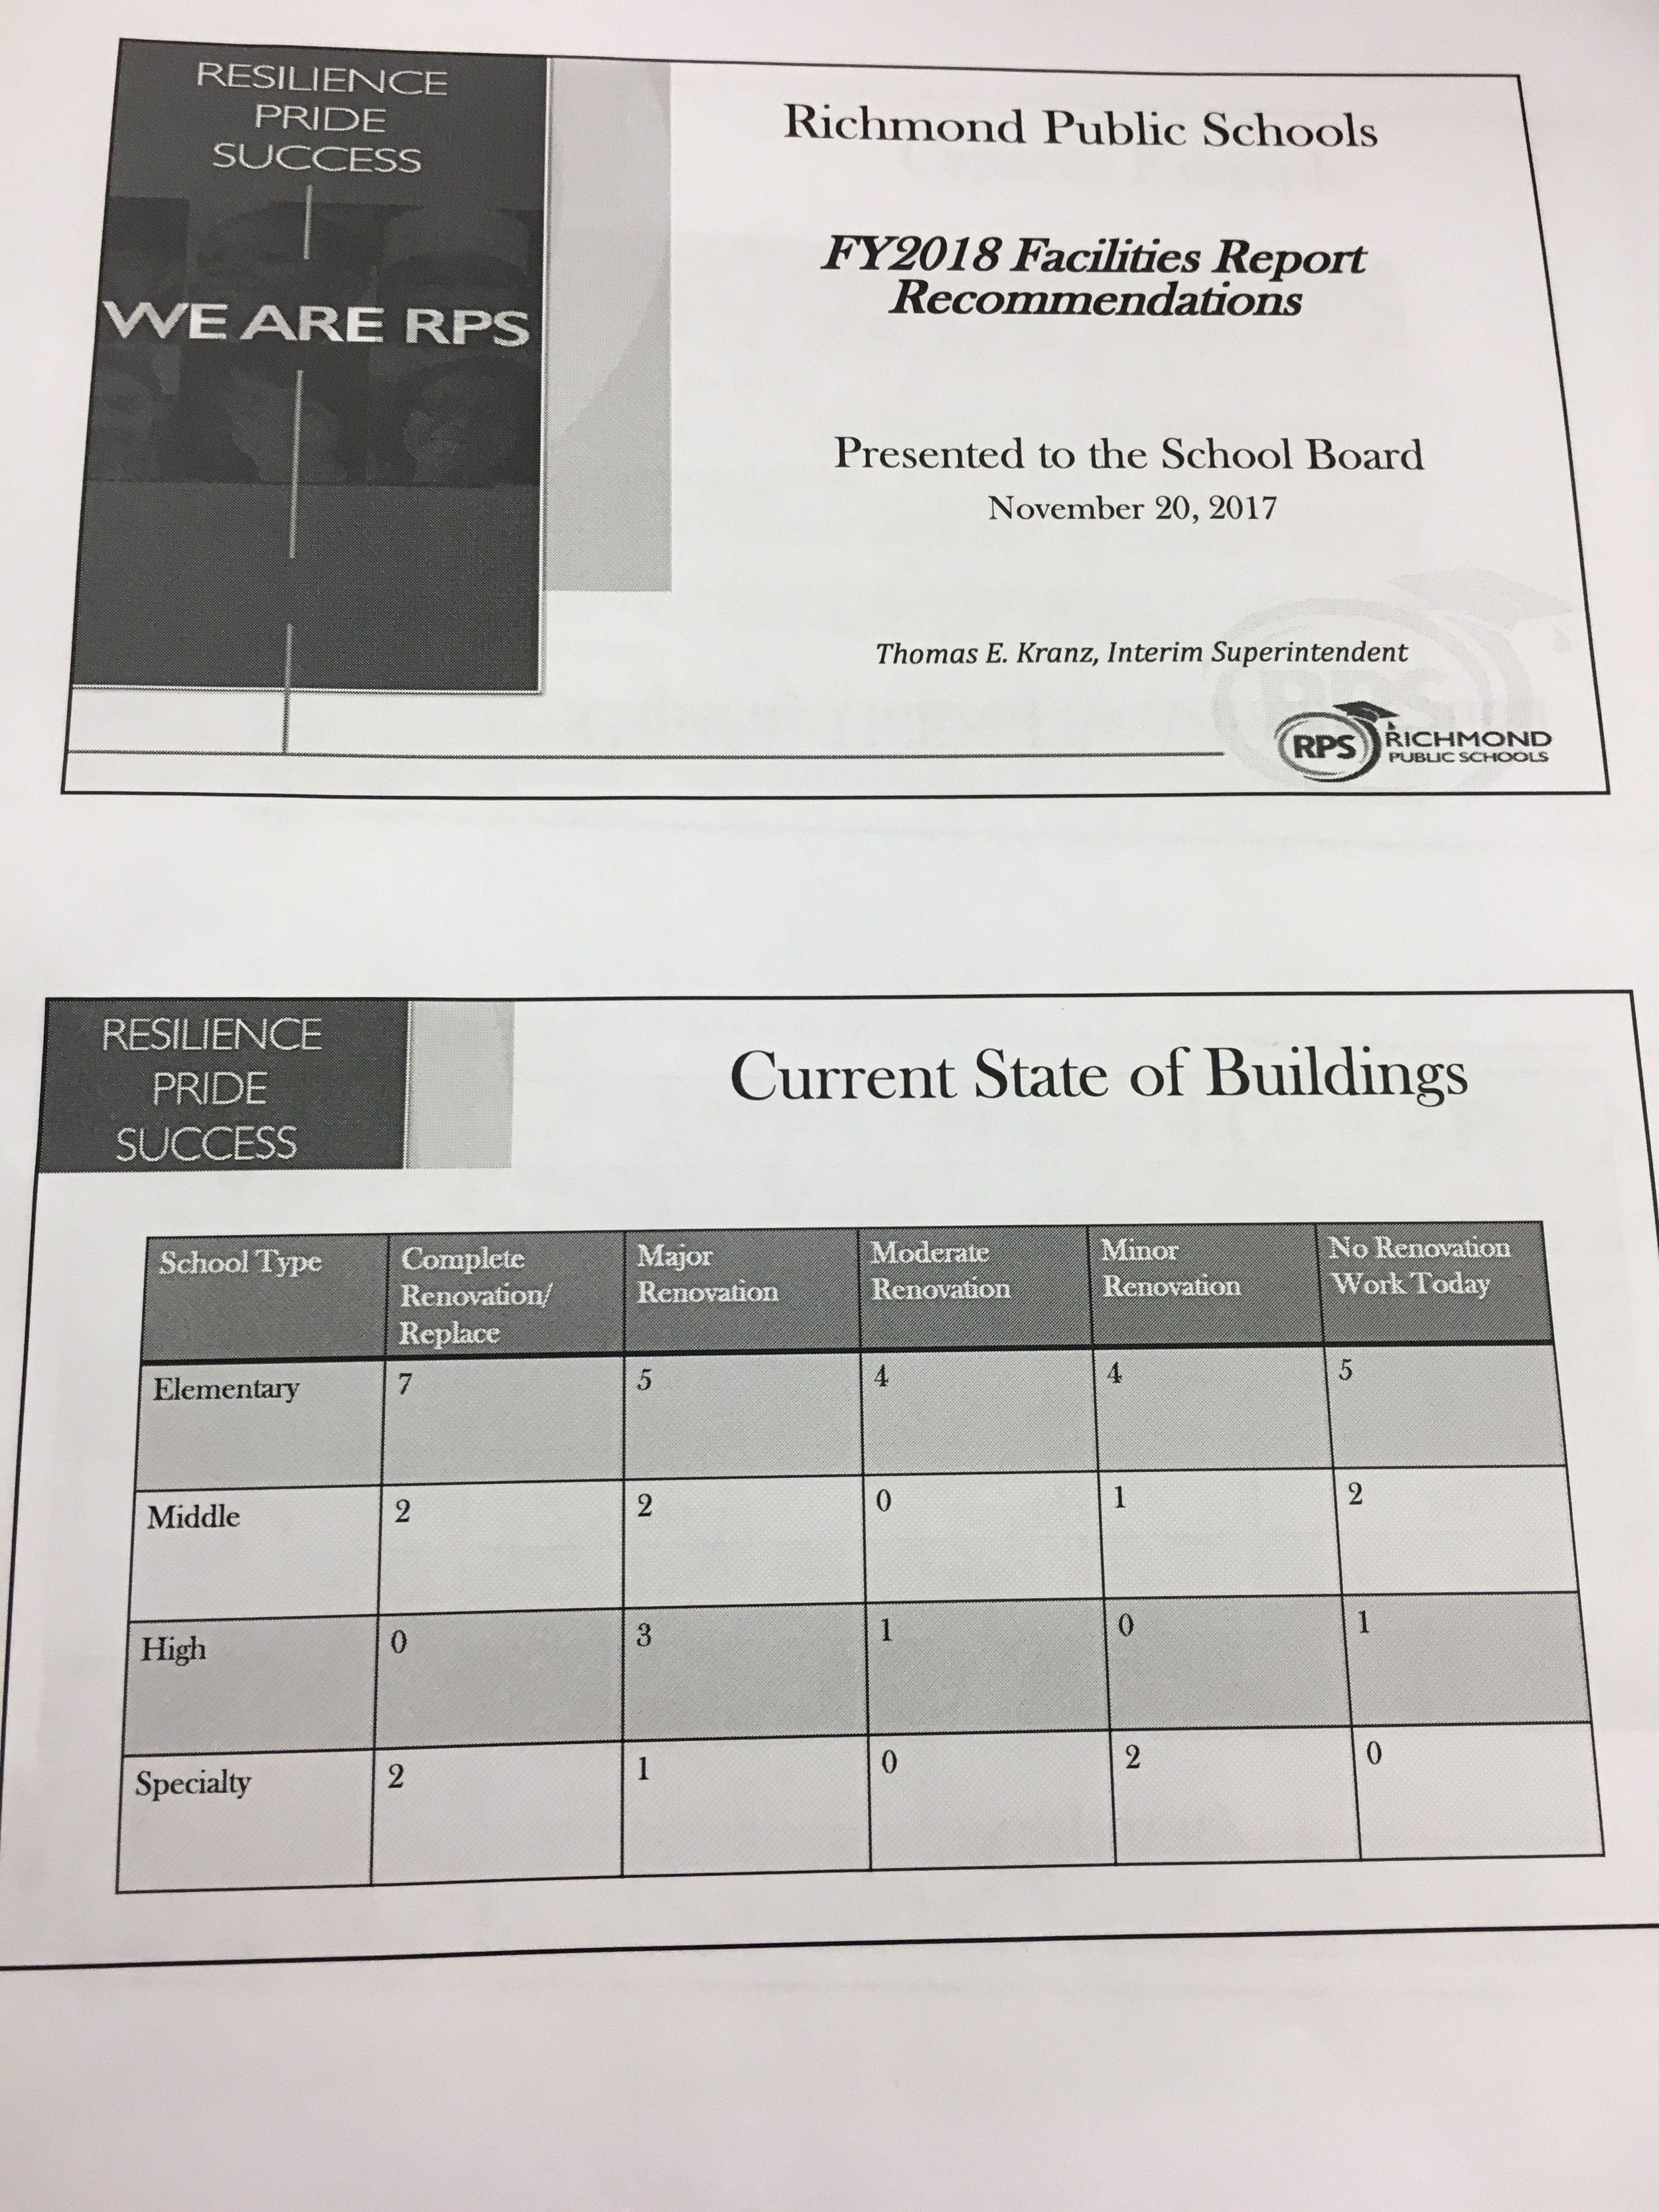 Facilities presentation hand out (November 20, 2017)